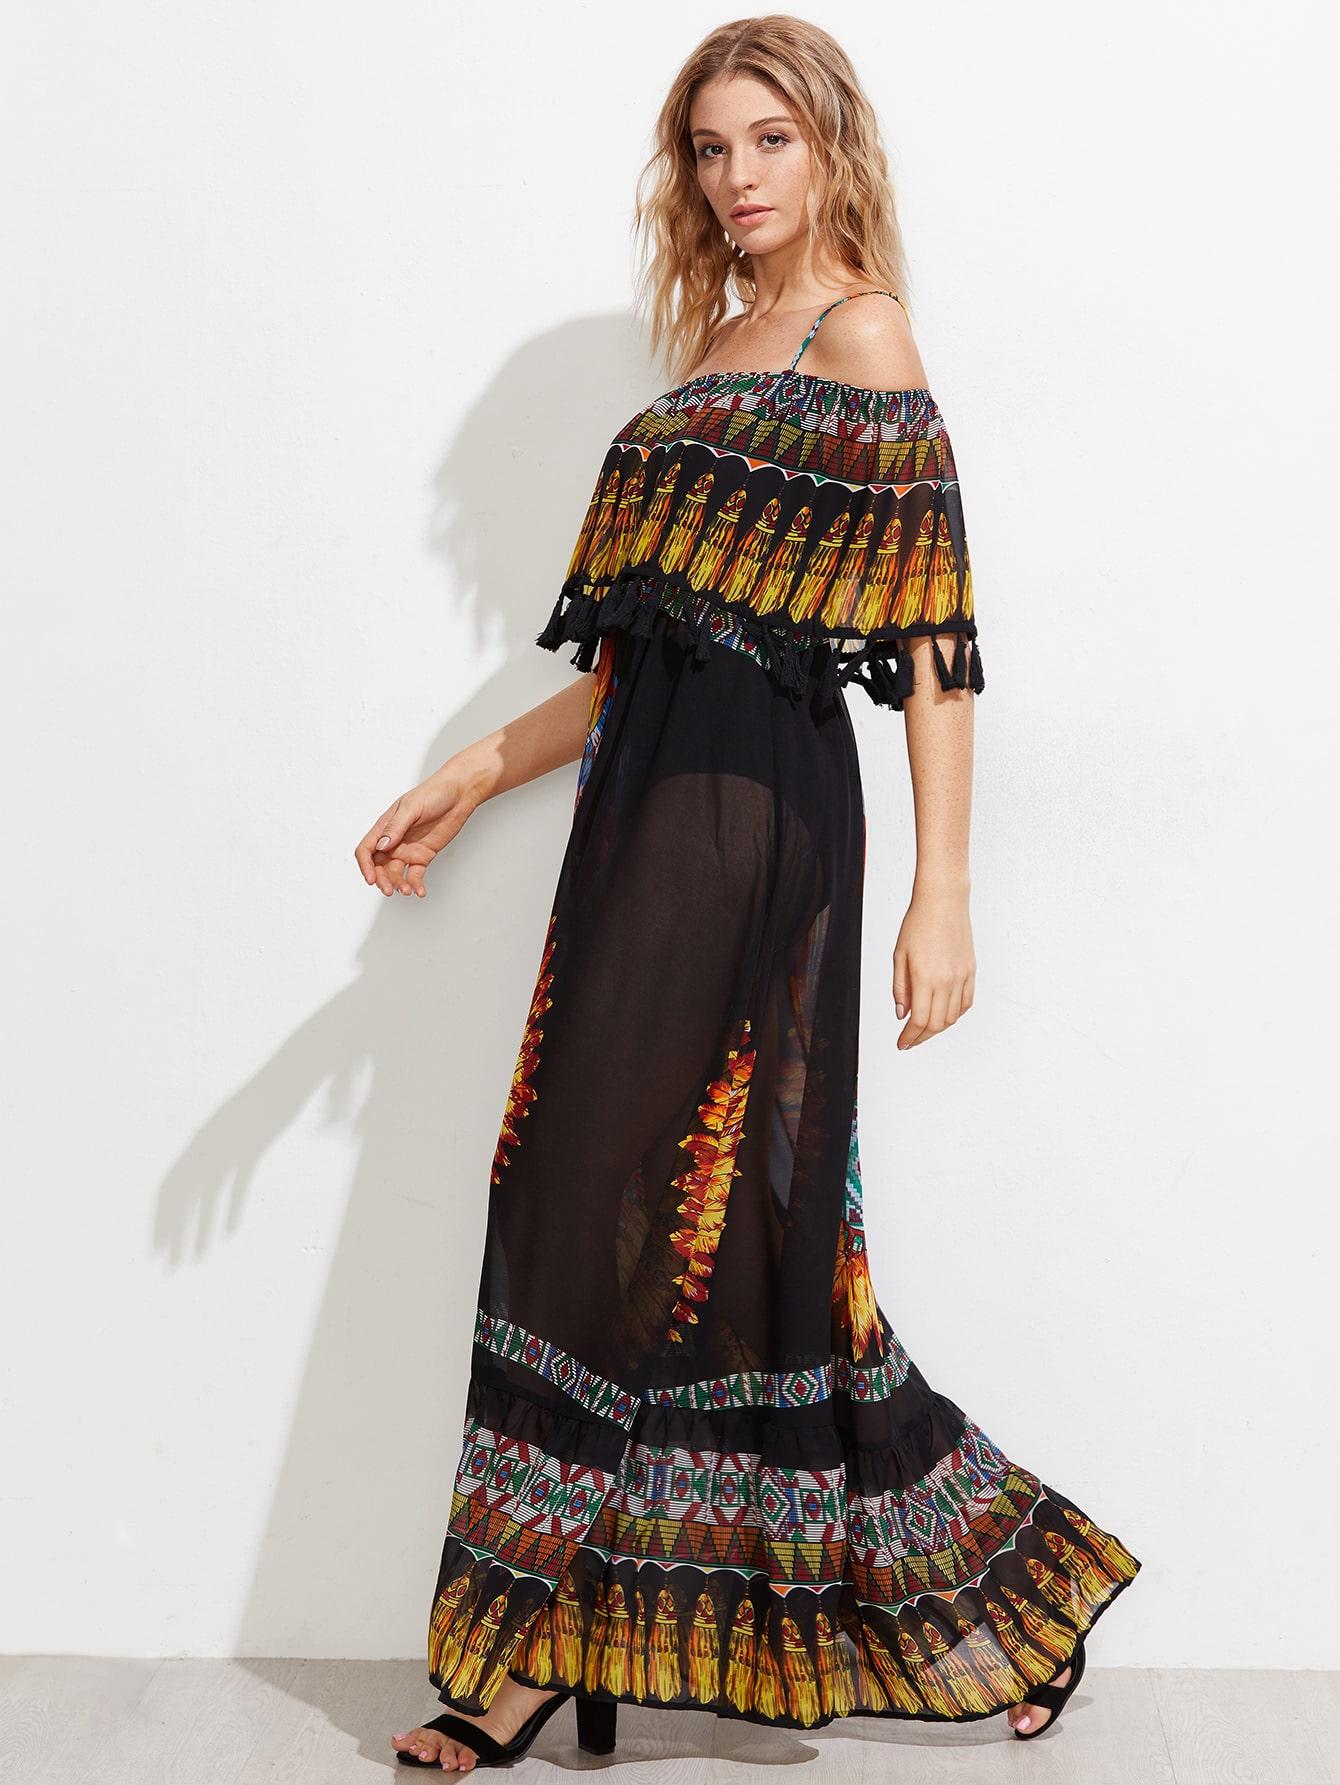 robe d coup e tages en tulle avec des franges french romwe. Black Bedroom Furniture Sets. Home Design Ideas